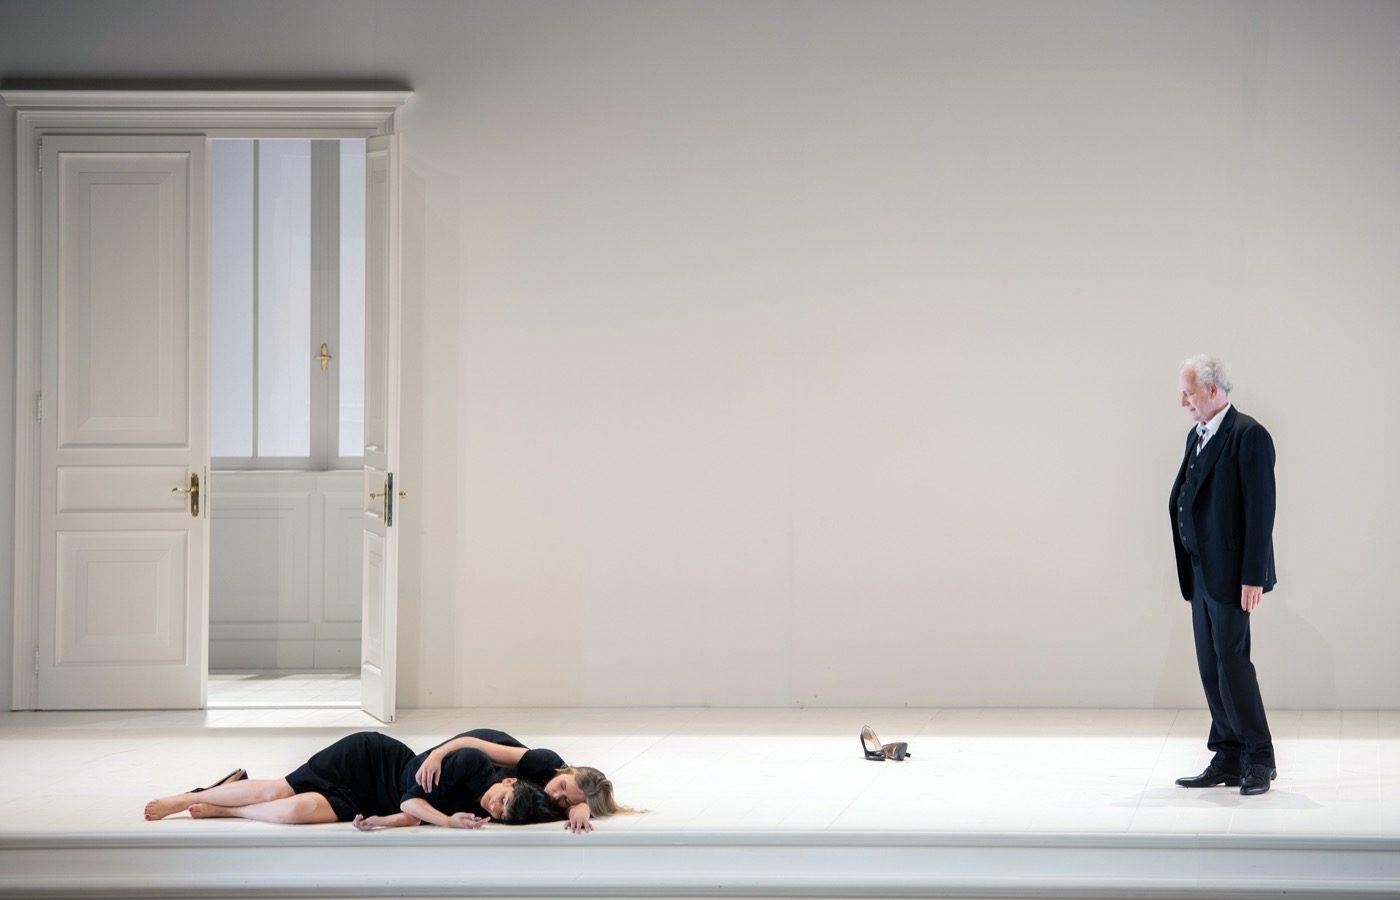 Leiacker-Loy-Cosi-Fan-Tutte-Monika-Rittershaus-Salzburger-Festspiele-2020-00100